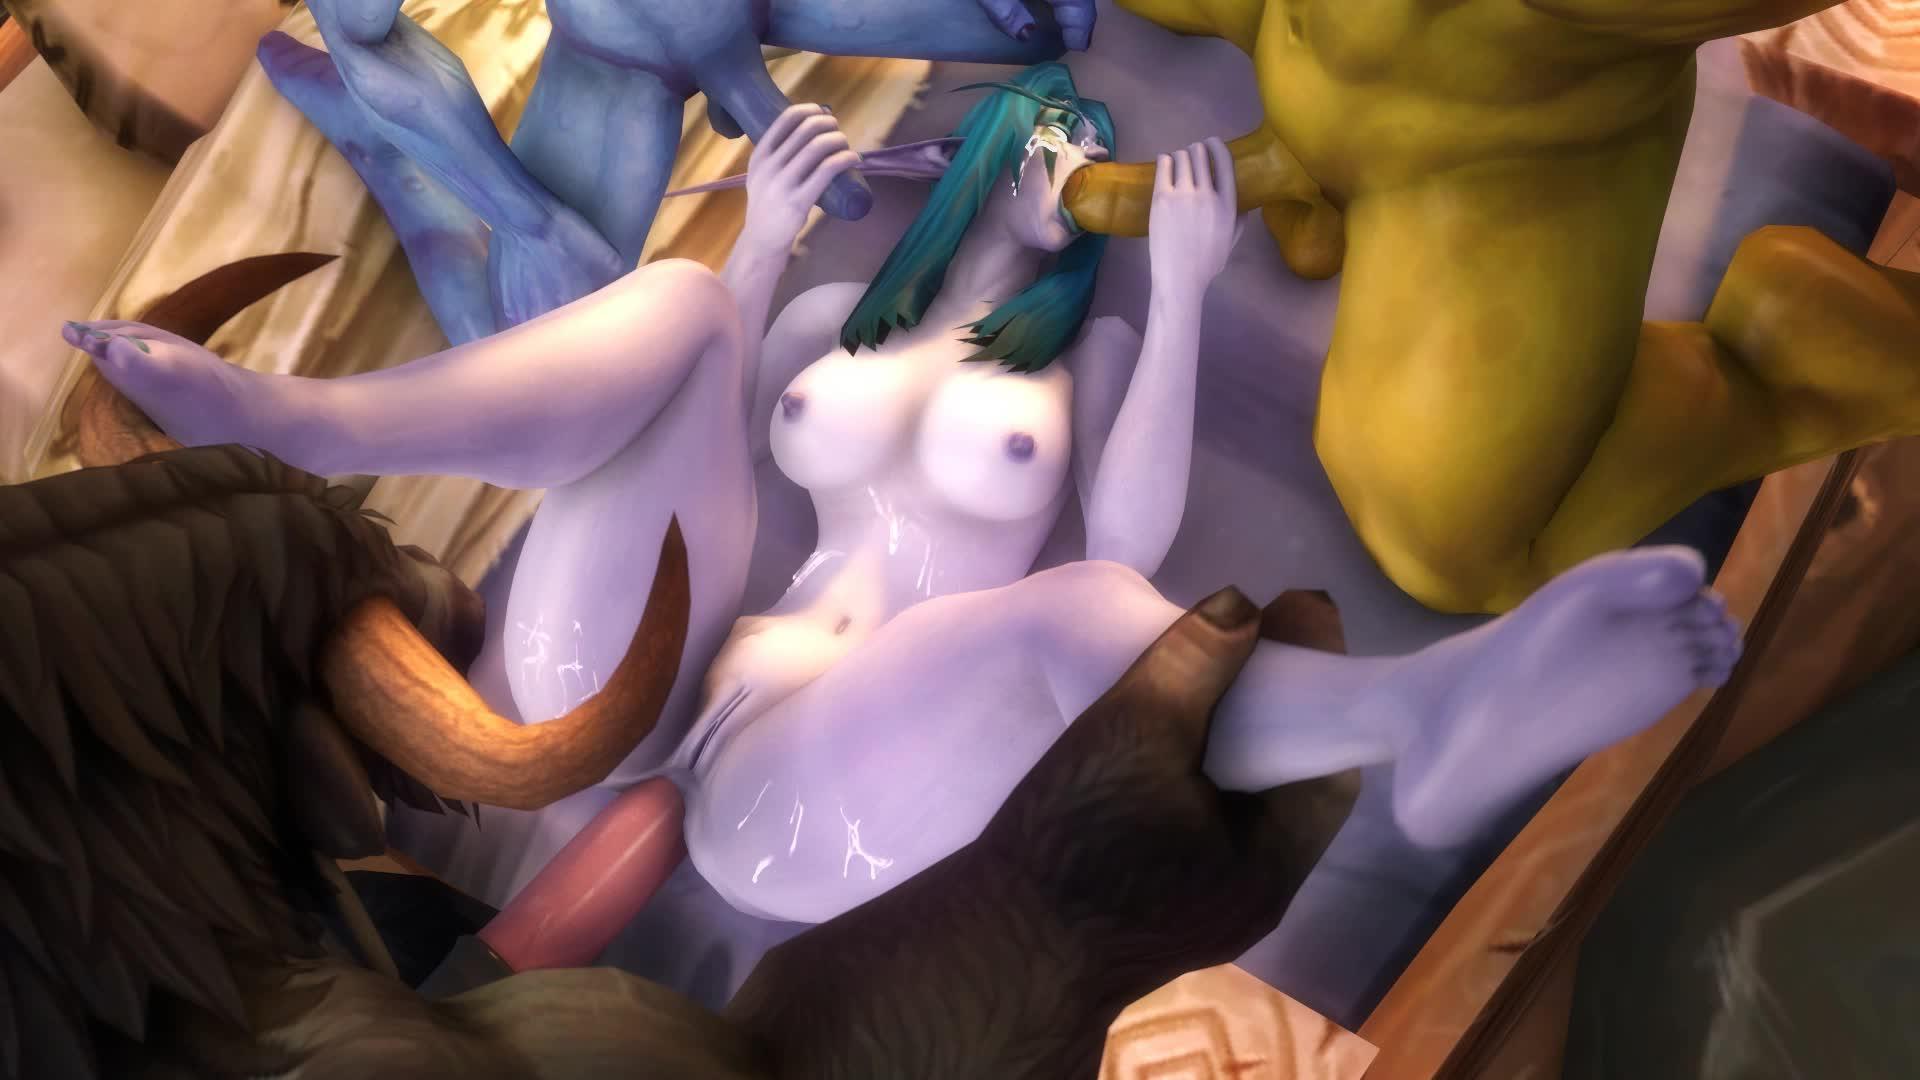 Free World Of Warcraft Night Elf Porn